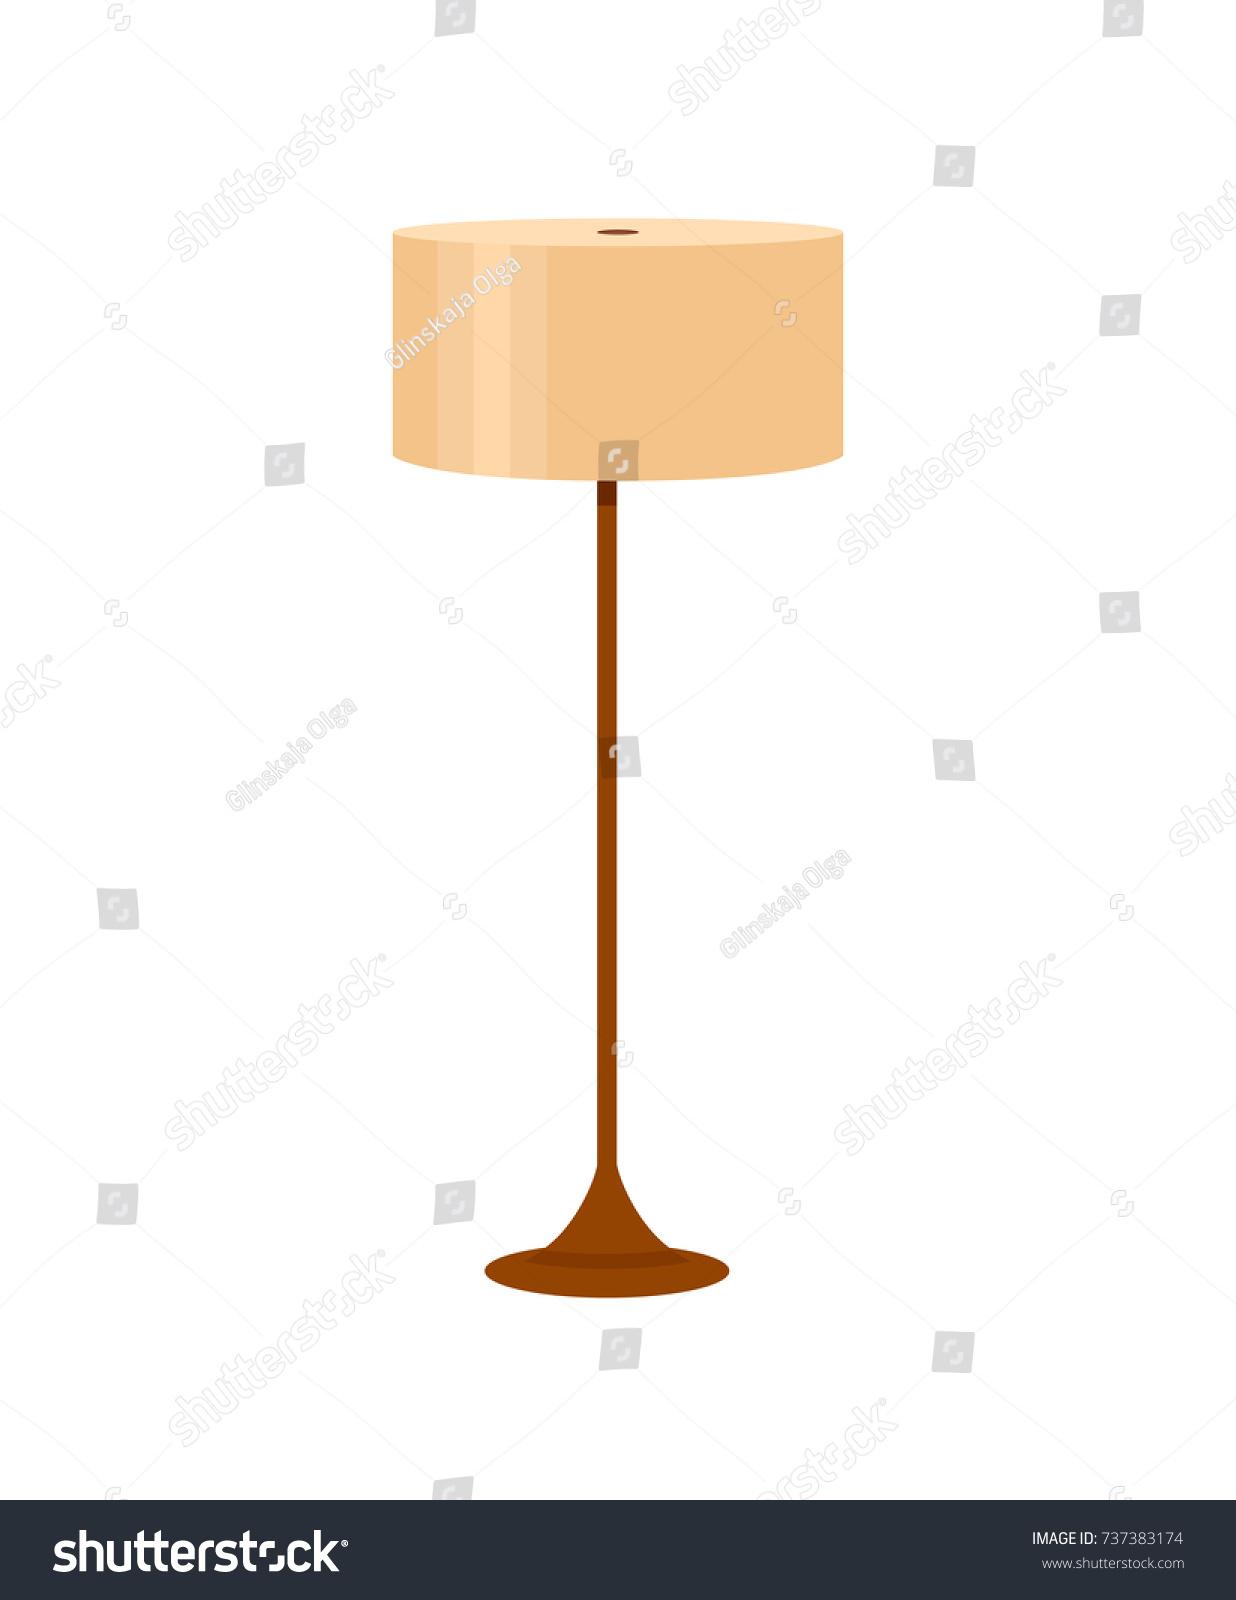 Colorful Cartoon Floor Lamp Light Icon Stock Vector 737383174 ... for Floor Lamp Clipart  34eri